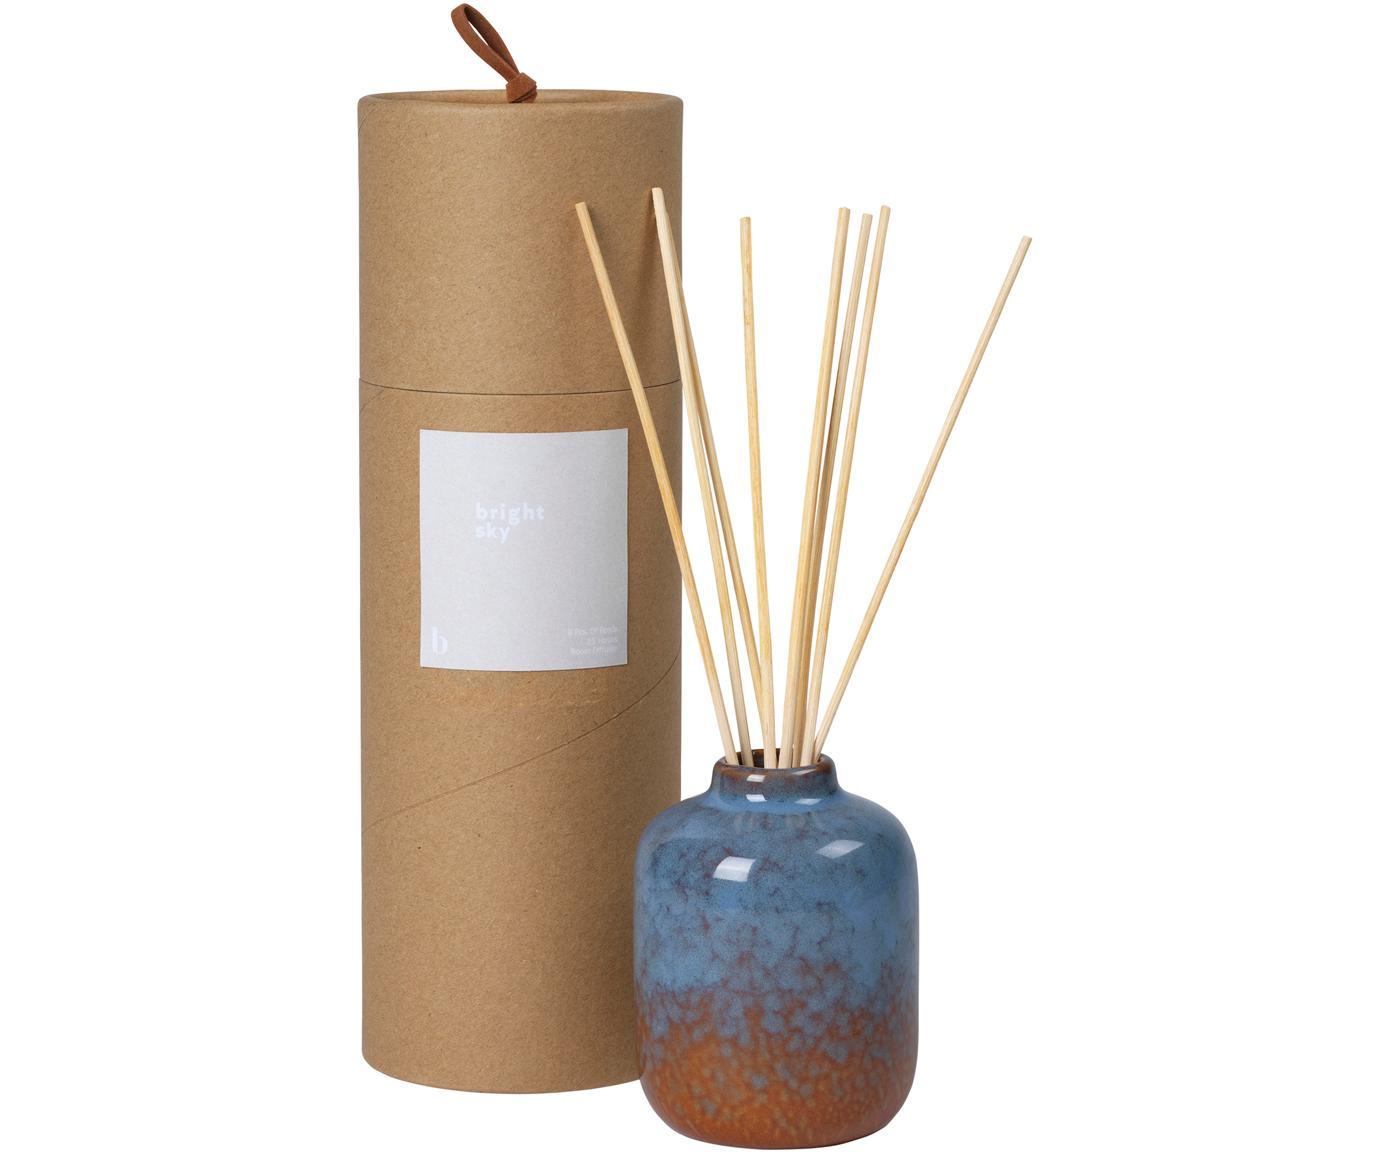 Diffuser Bright Sky, Behälter: Keramik, Braun, Blau, Ø 7 x H 9 cm